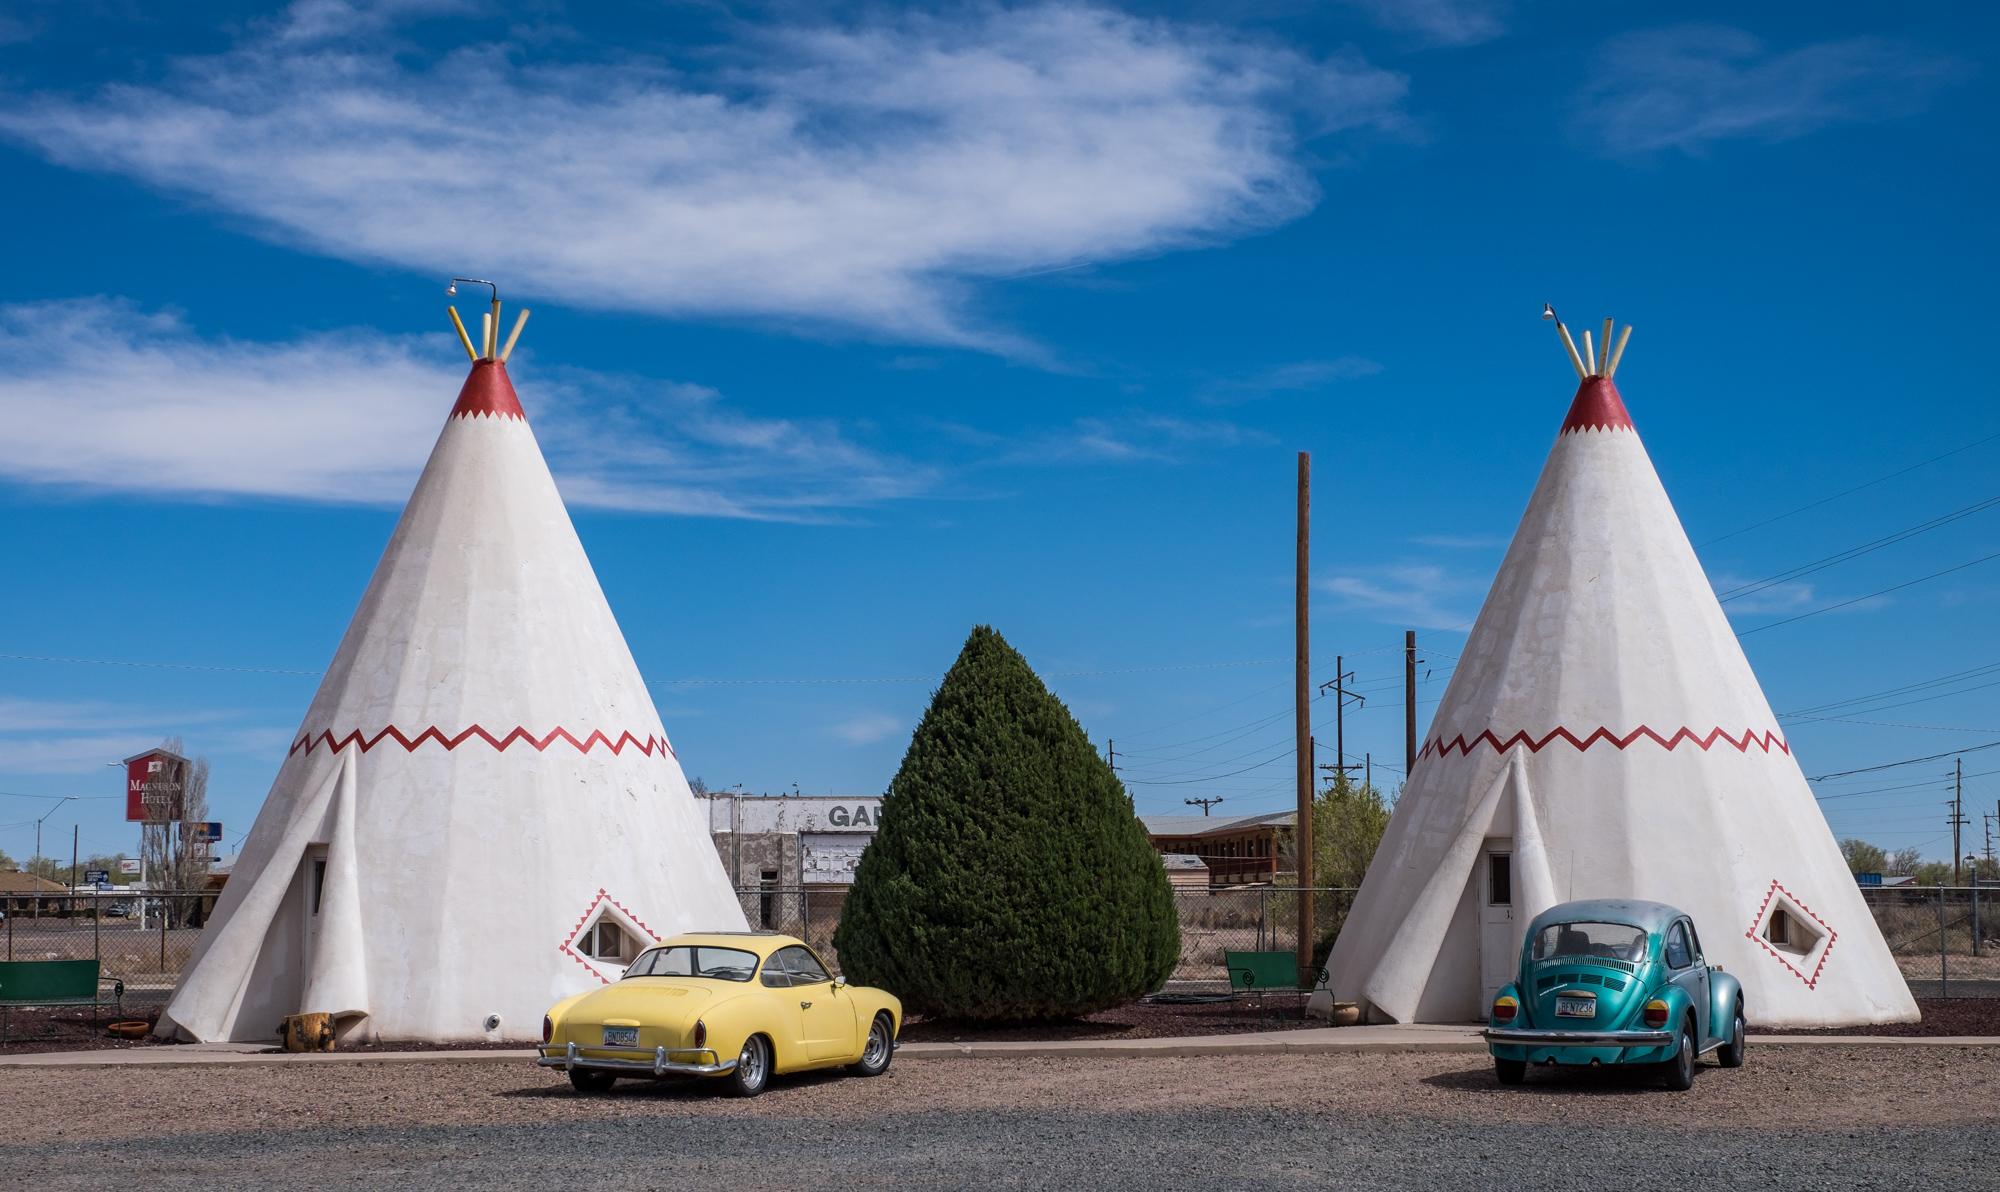 Old cars help make the strange teepee shaped hotel rooms even stranger.